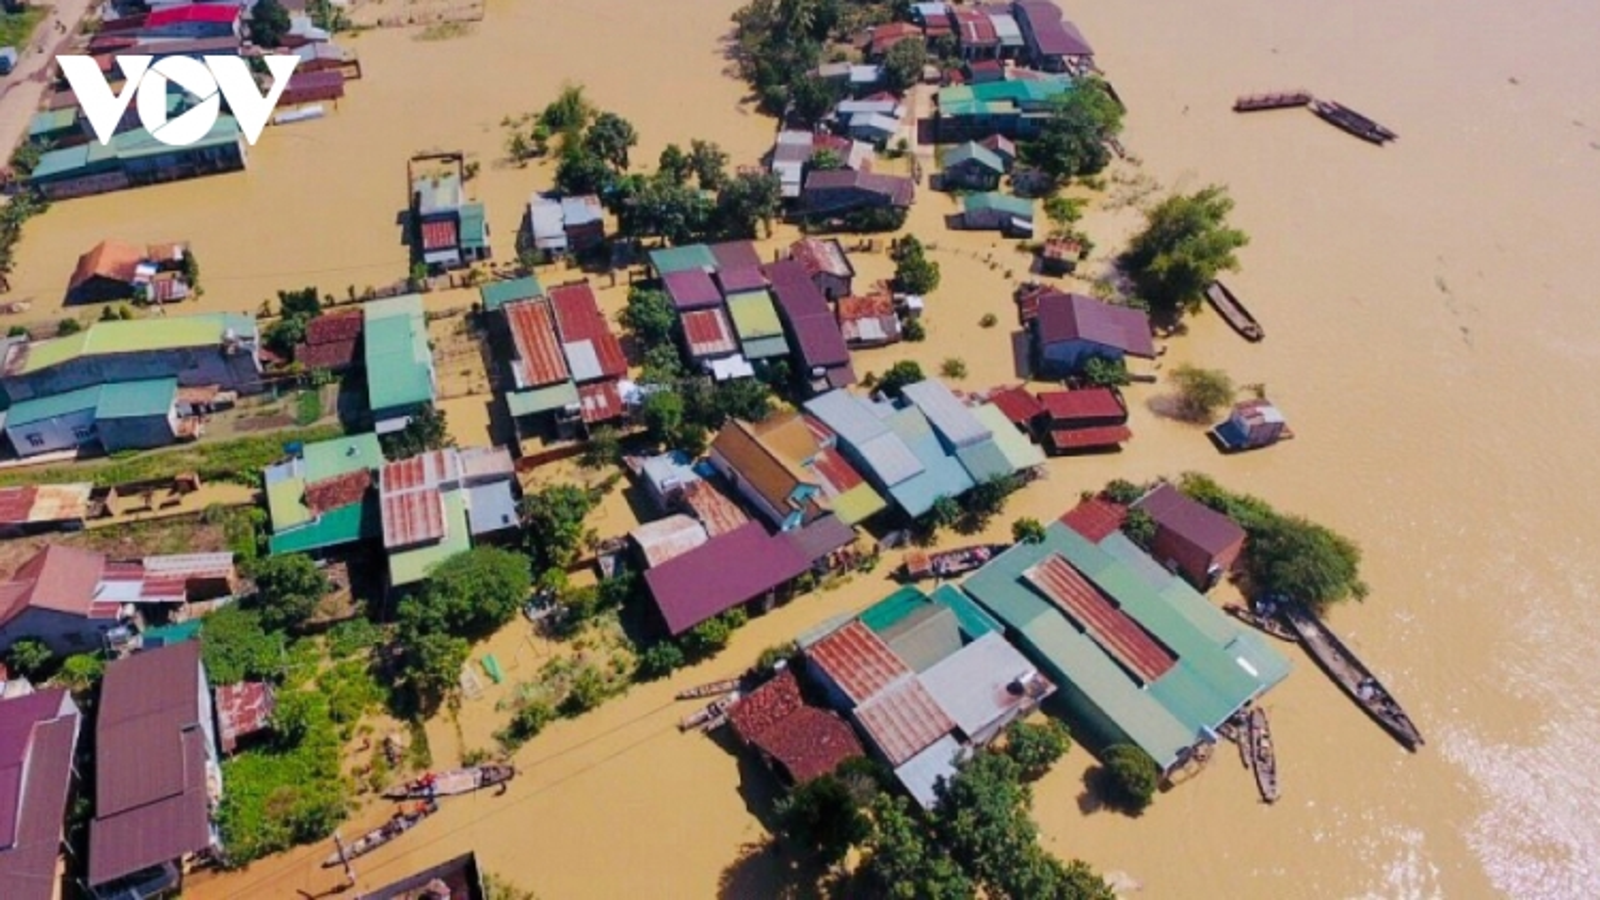 Dak Lak, Dak Nong provinces endure serious flooding despite halt in rain